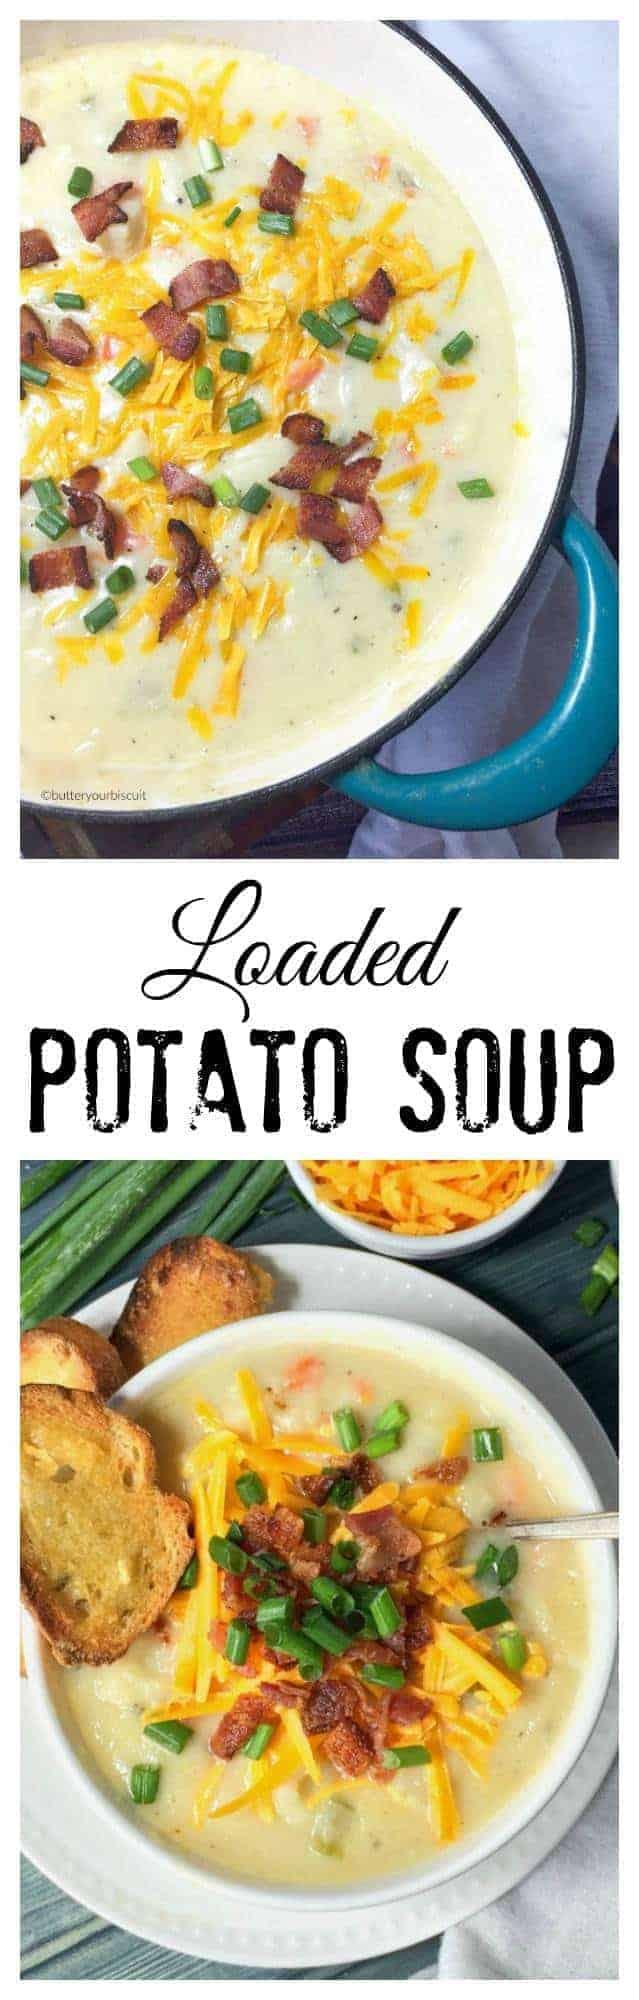 loaded-potato-soup-lp-2